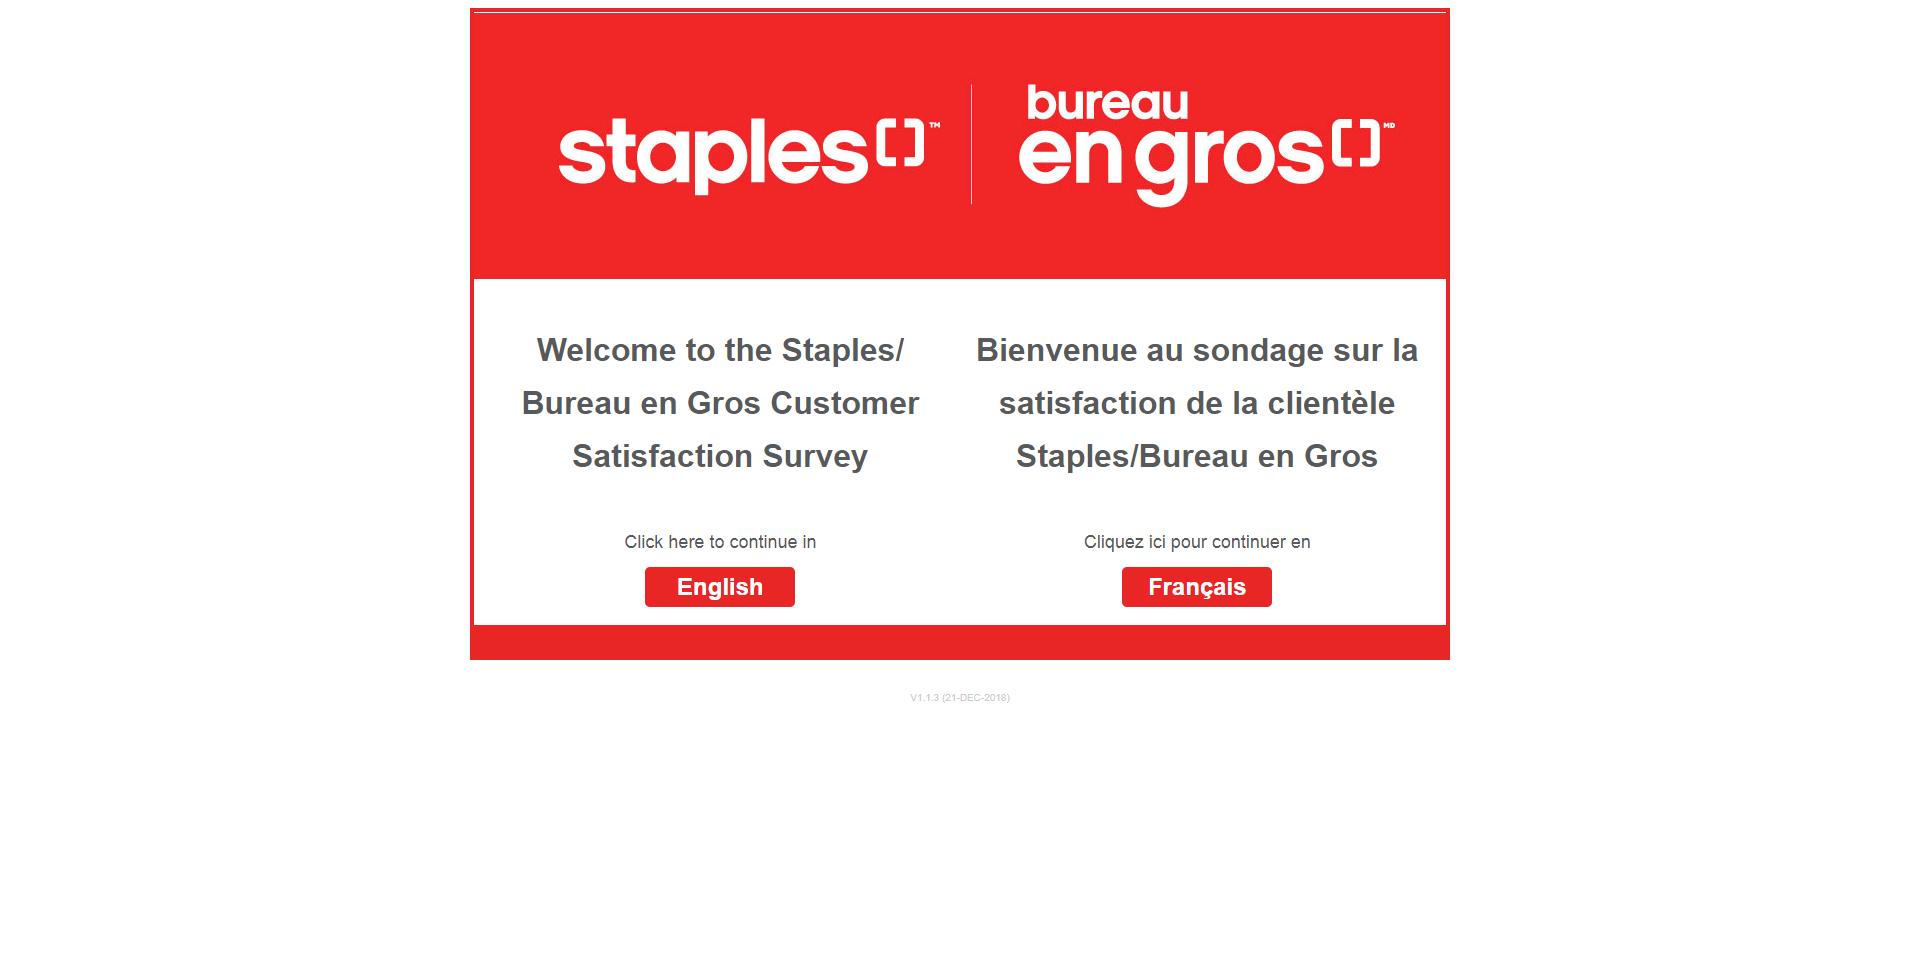 stapleslistens.ca